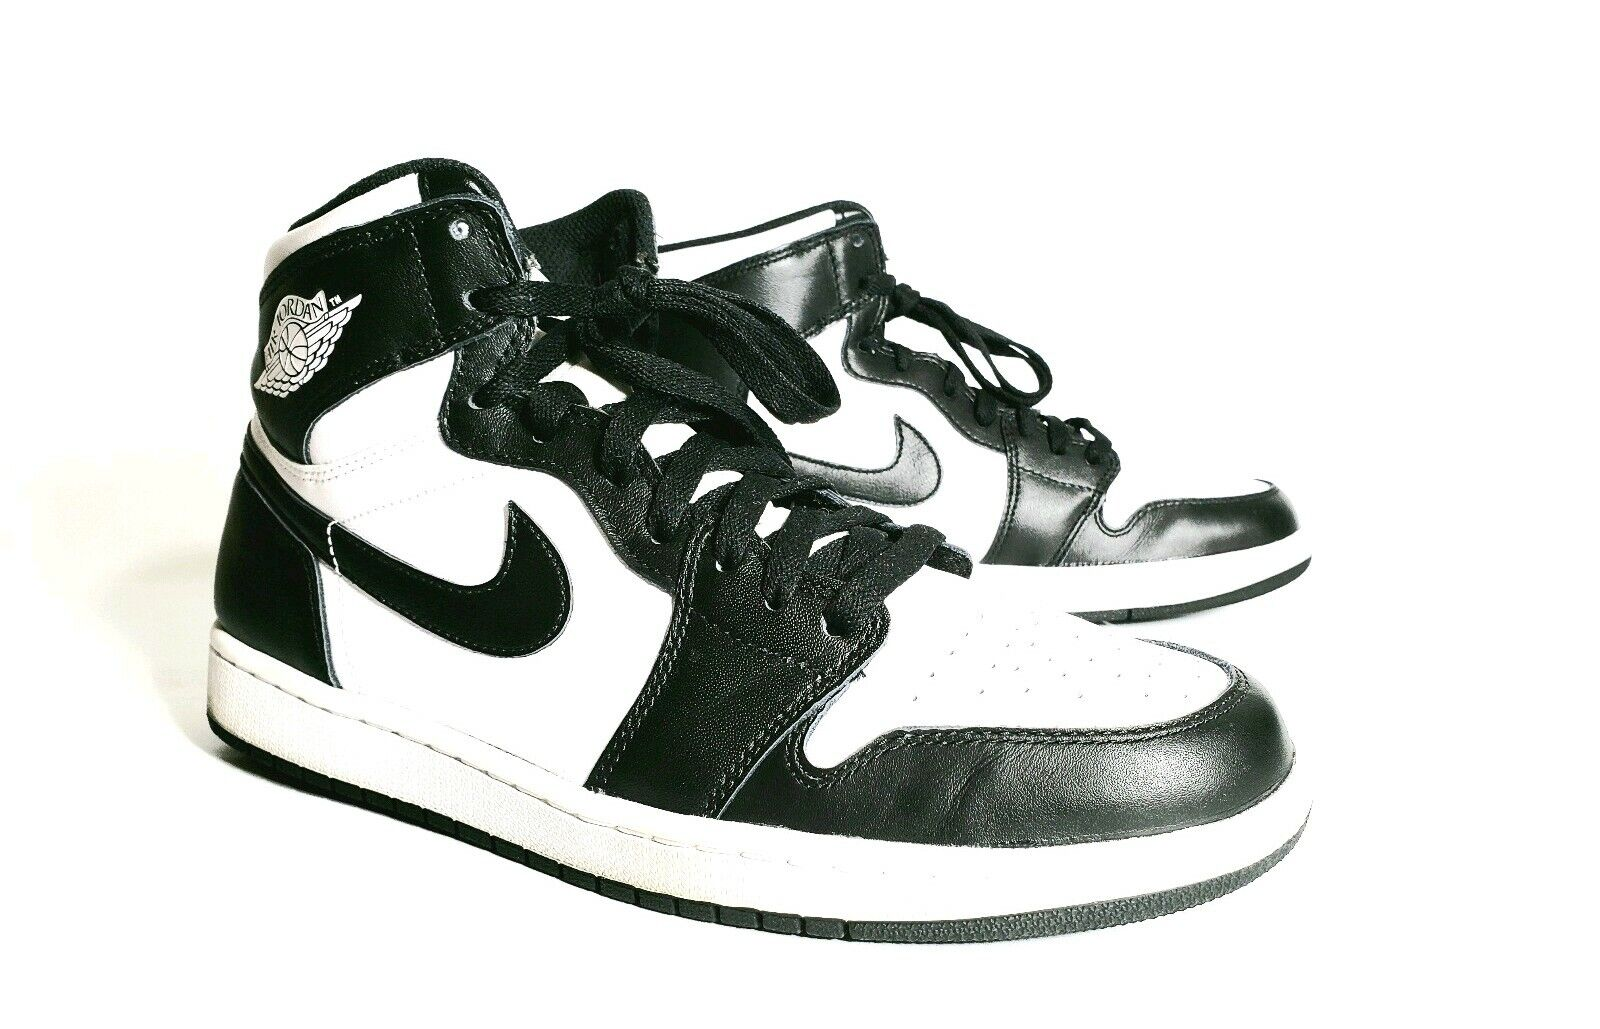 Air Jordan 1 High OG Retro White Black 2014 Size 10 yeezy supreme vtg vnds off